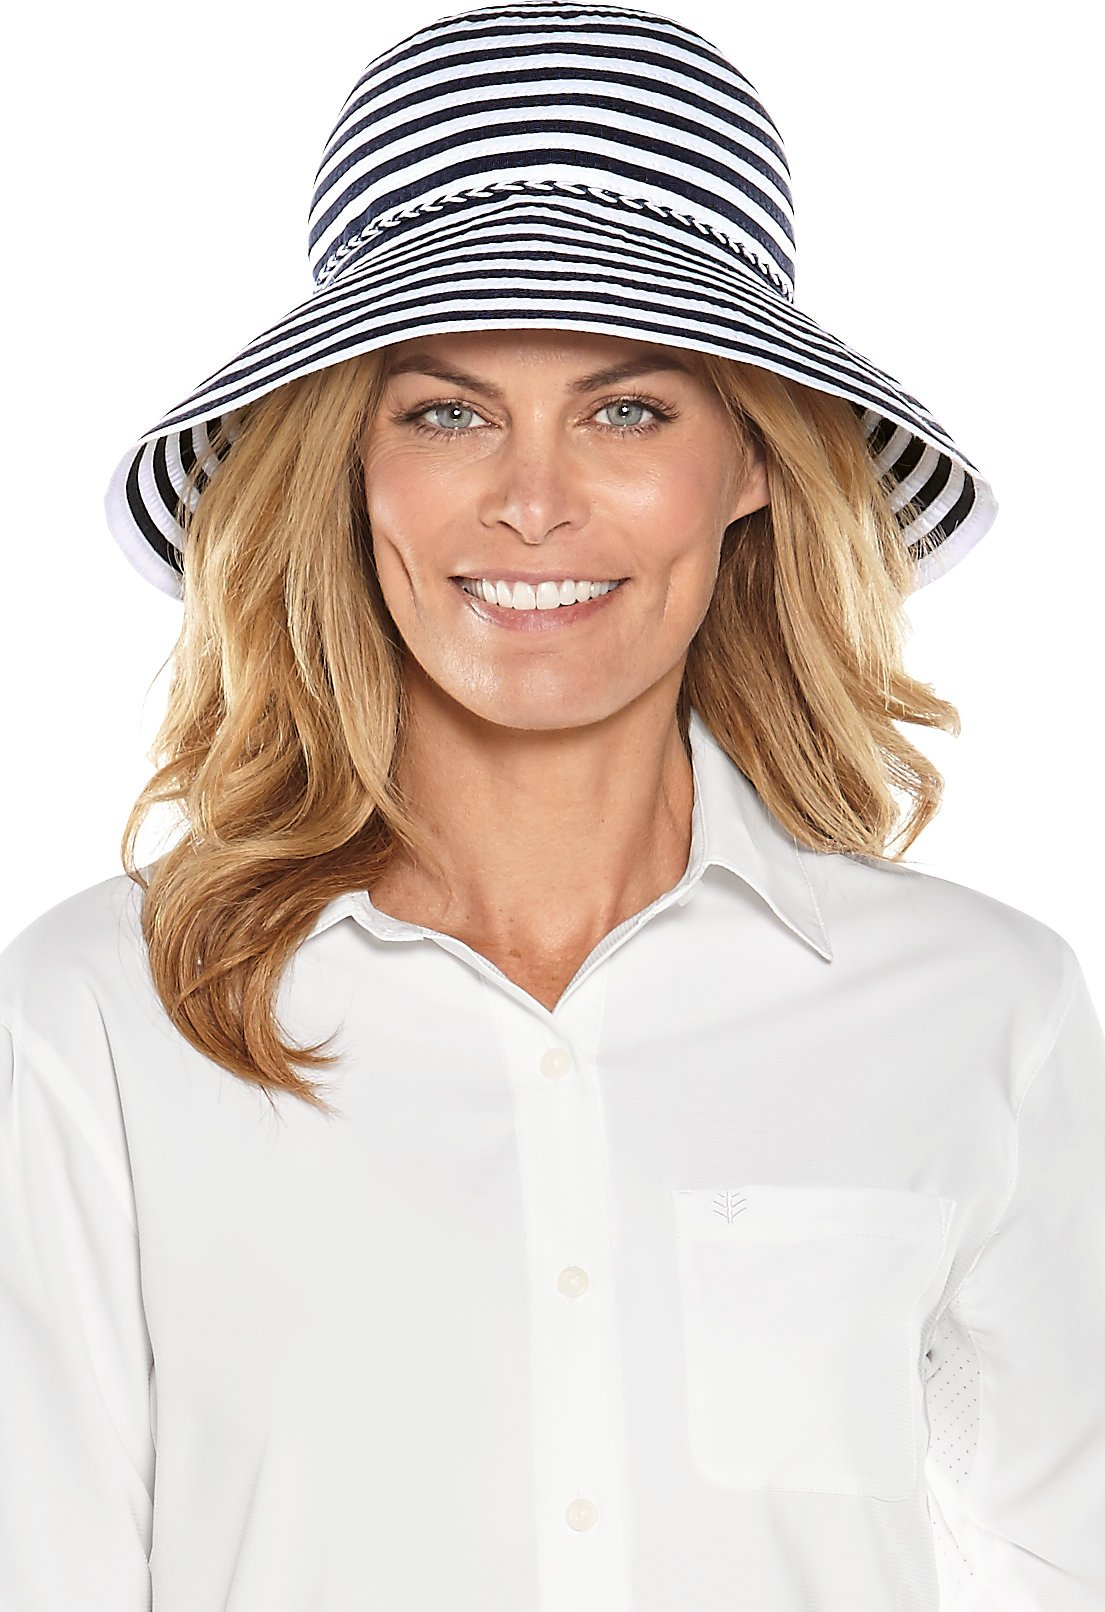 Coolibar UPF 50+ Women's Audrey Ribbon Bucket Hat - Sun Protective (One Size- Navy/White Small Stripe)